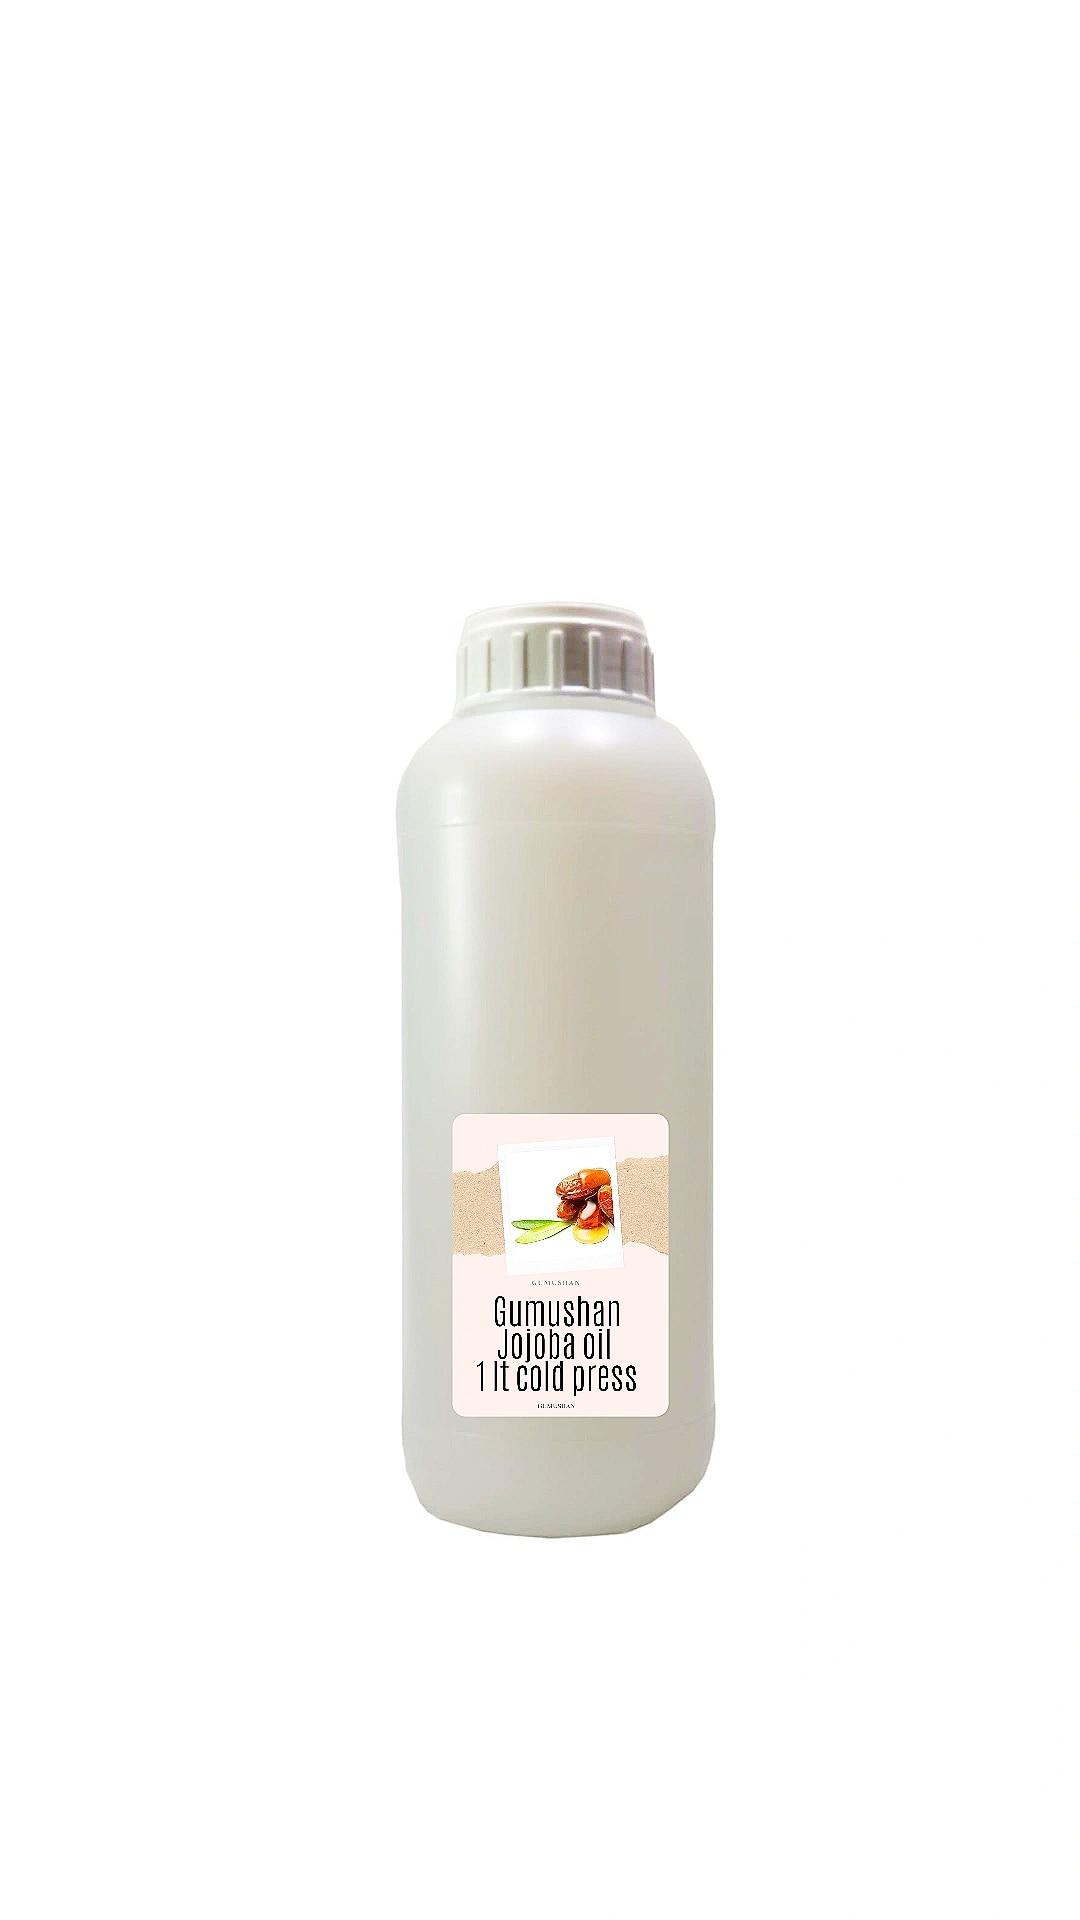 High quality pure Jojoba Oil 1 liter 34 fl oz 1000ml